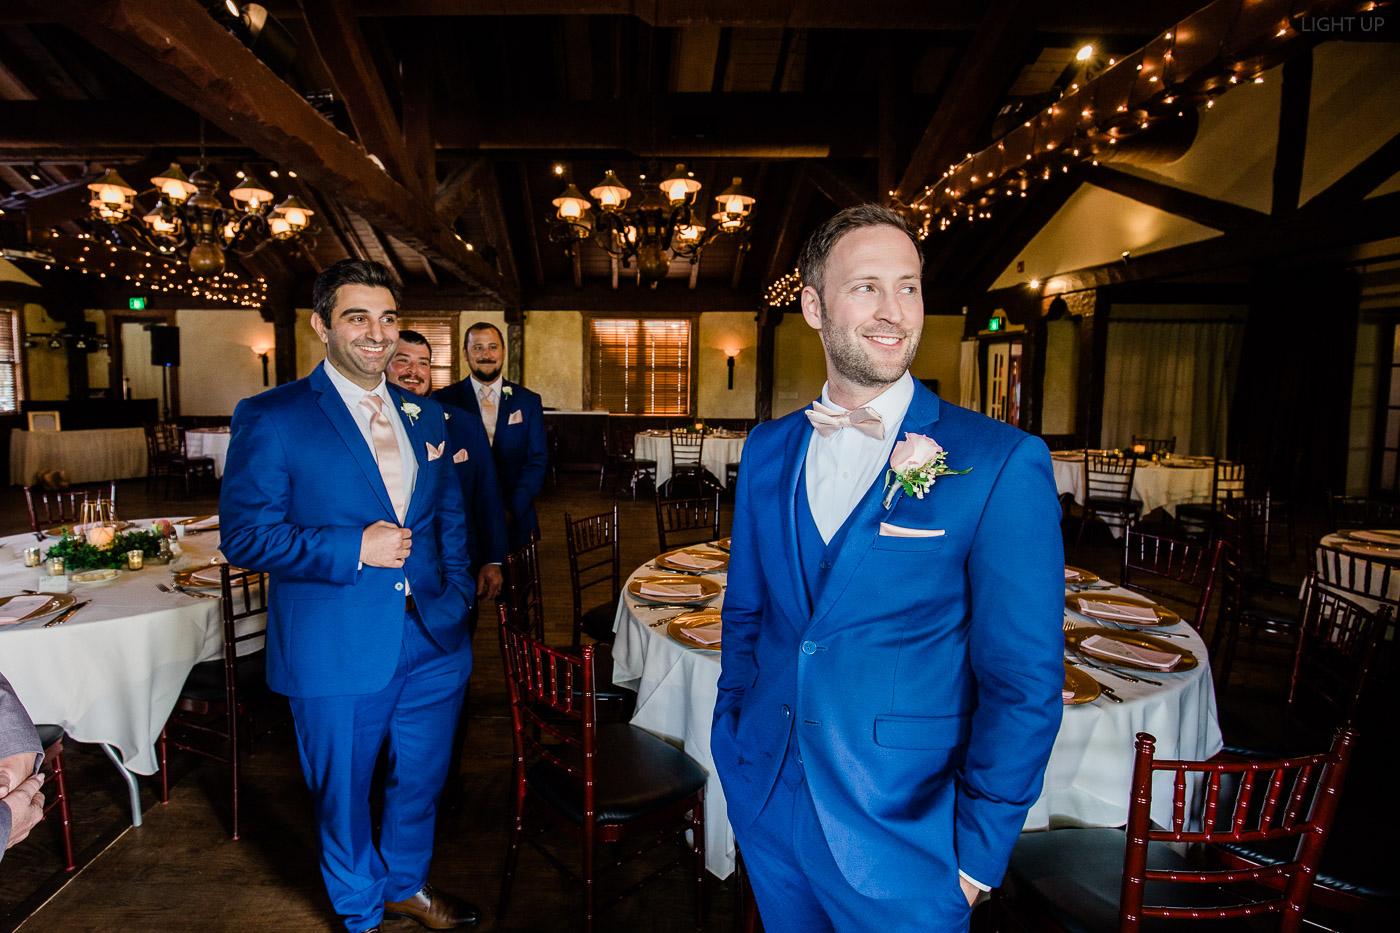 hstoric-dubsdread-wedding-orlando-2.jpg